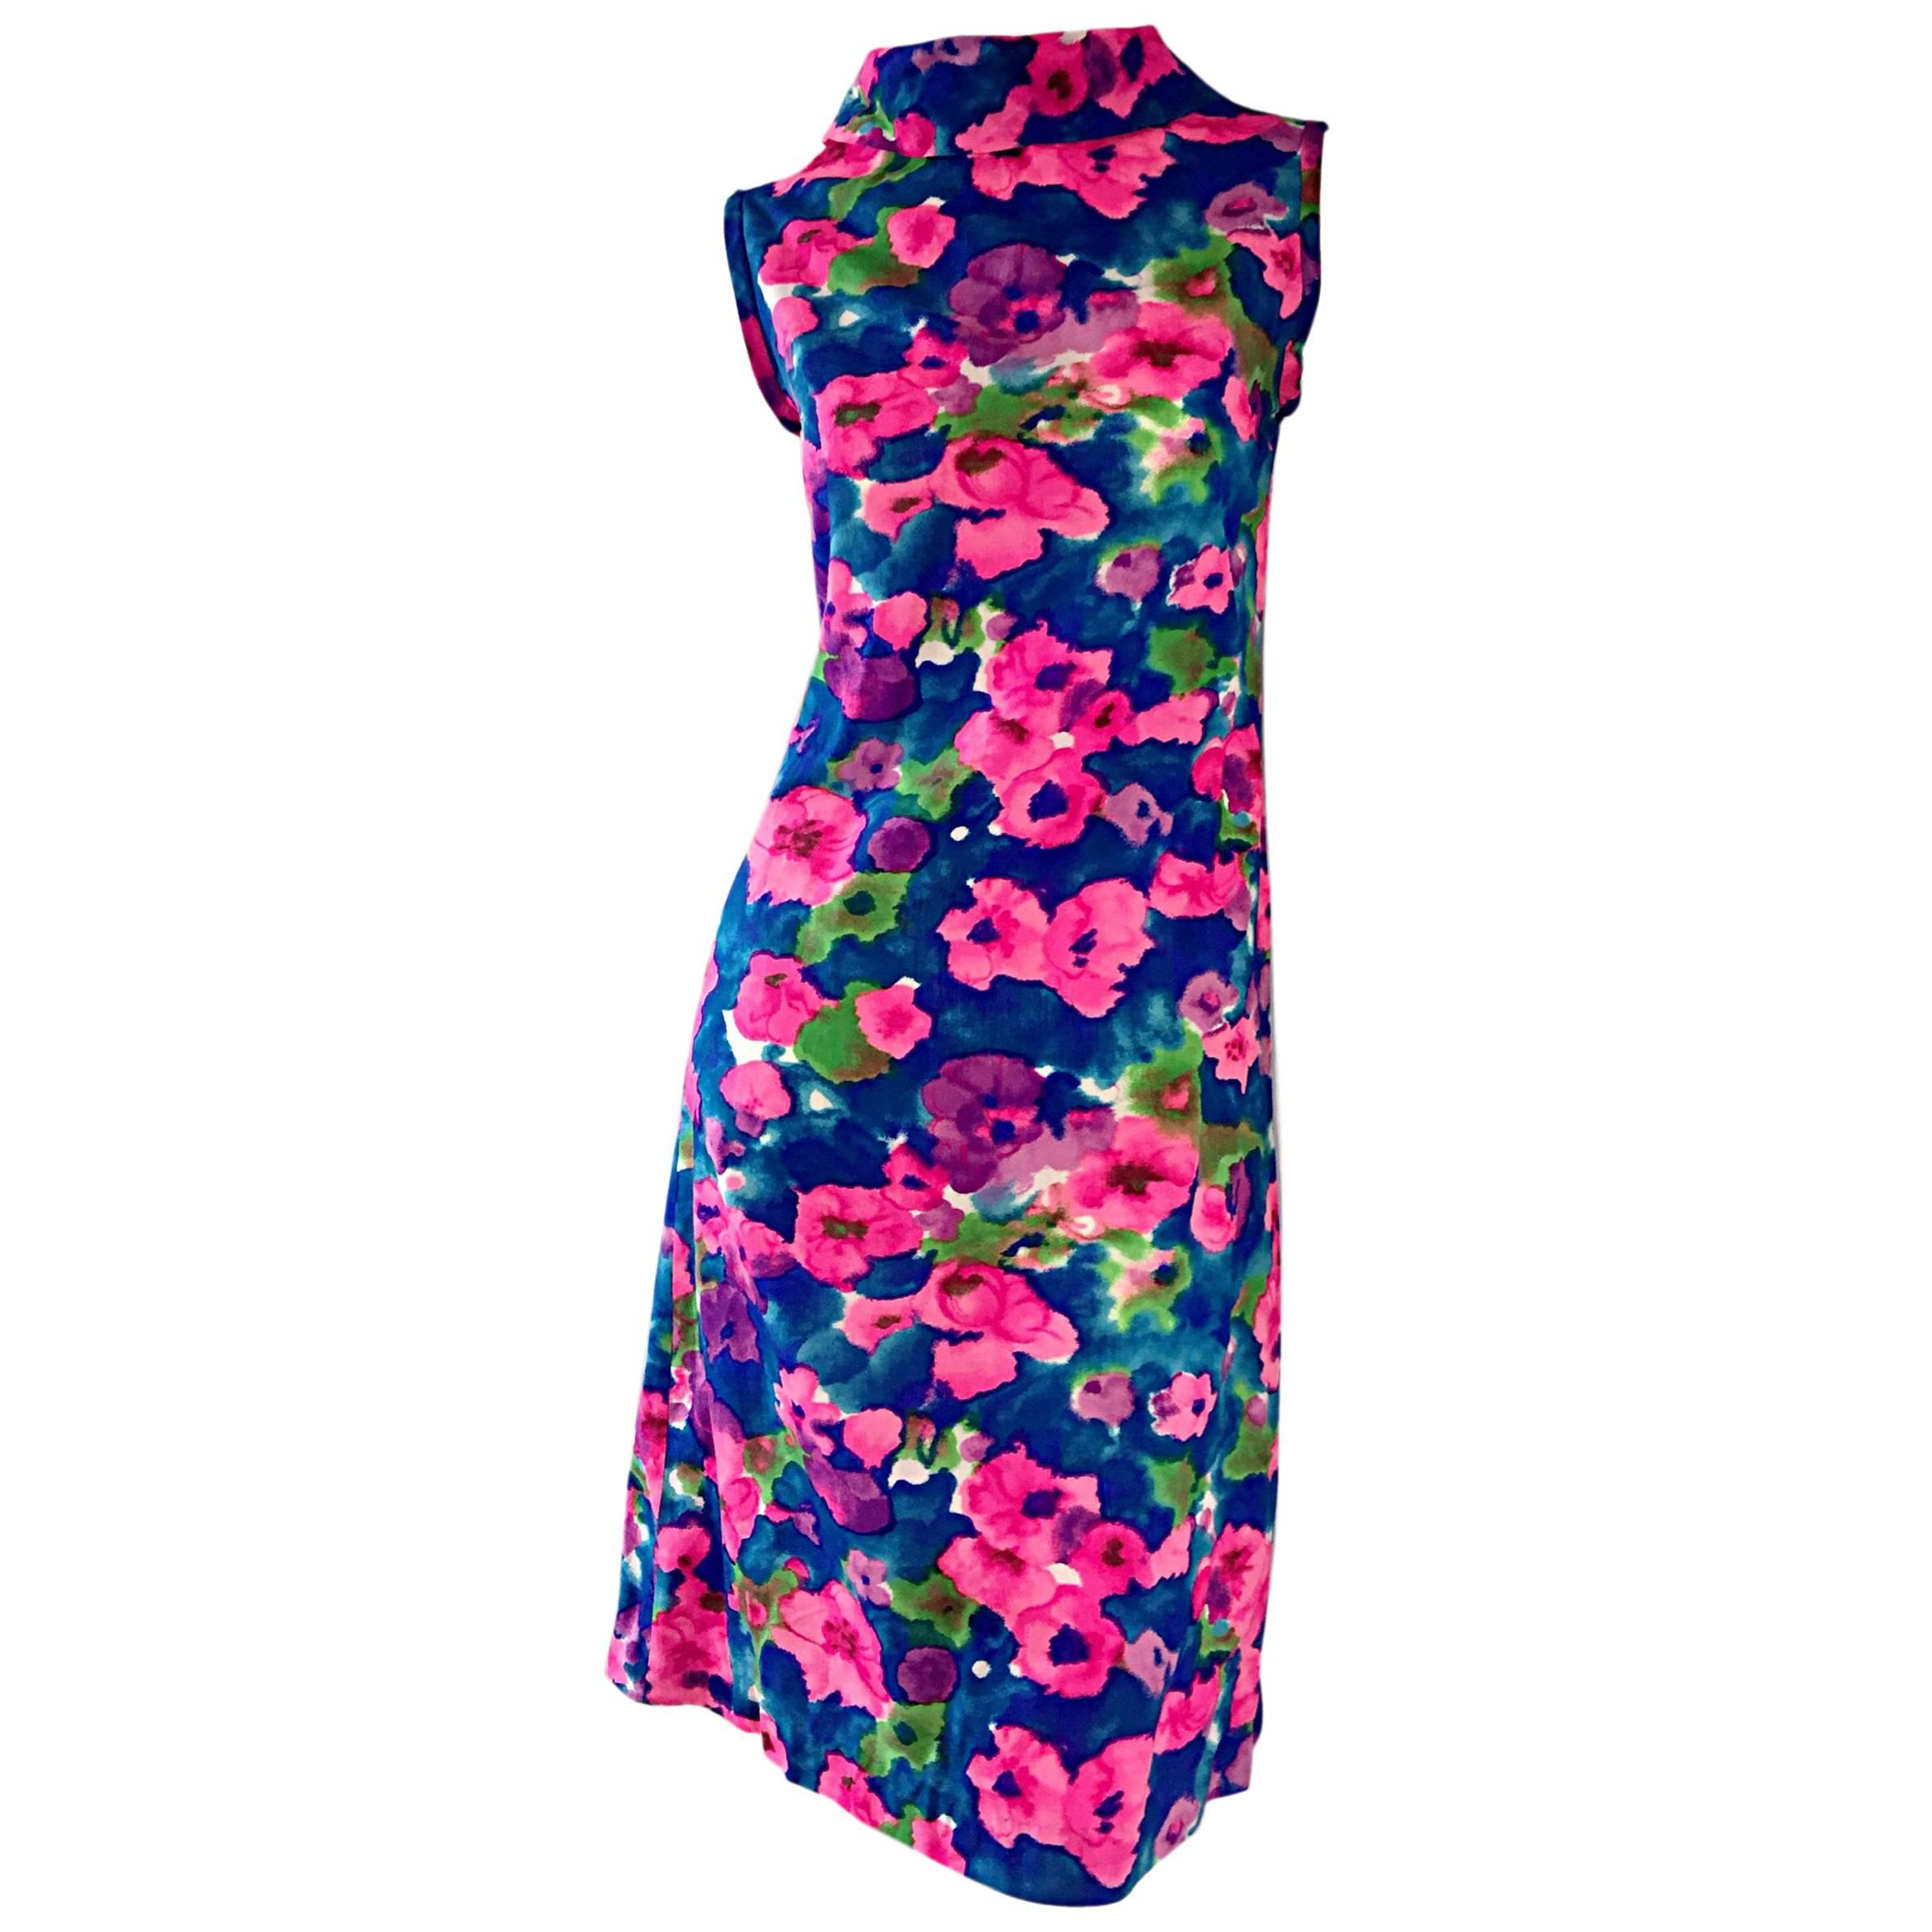 Chic Vintage 1960s Floral Watercolor Print A - Line 60s Colorful Dress